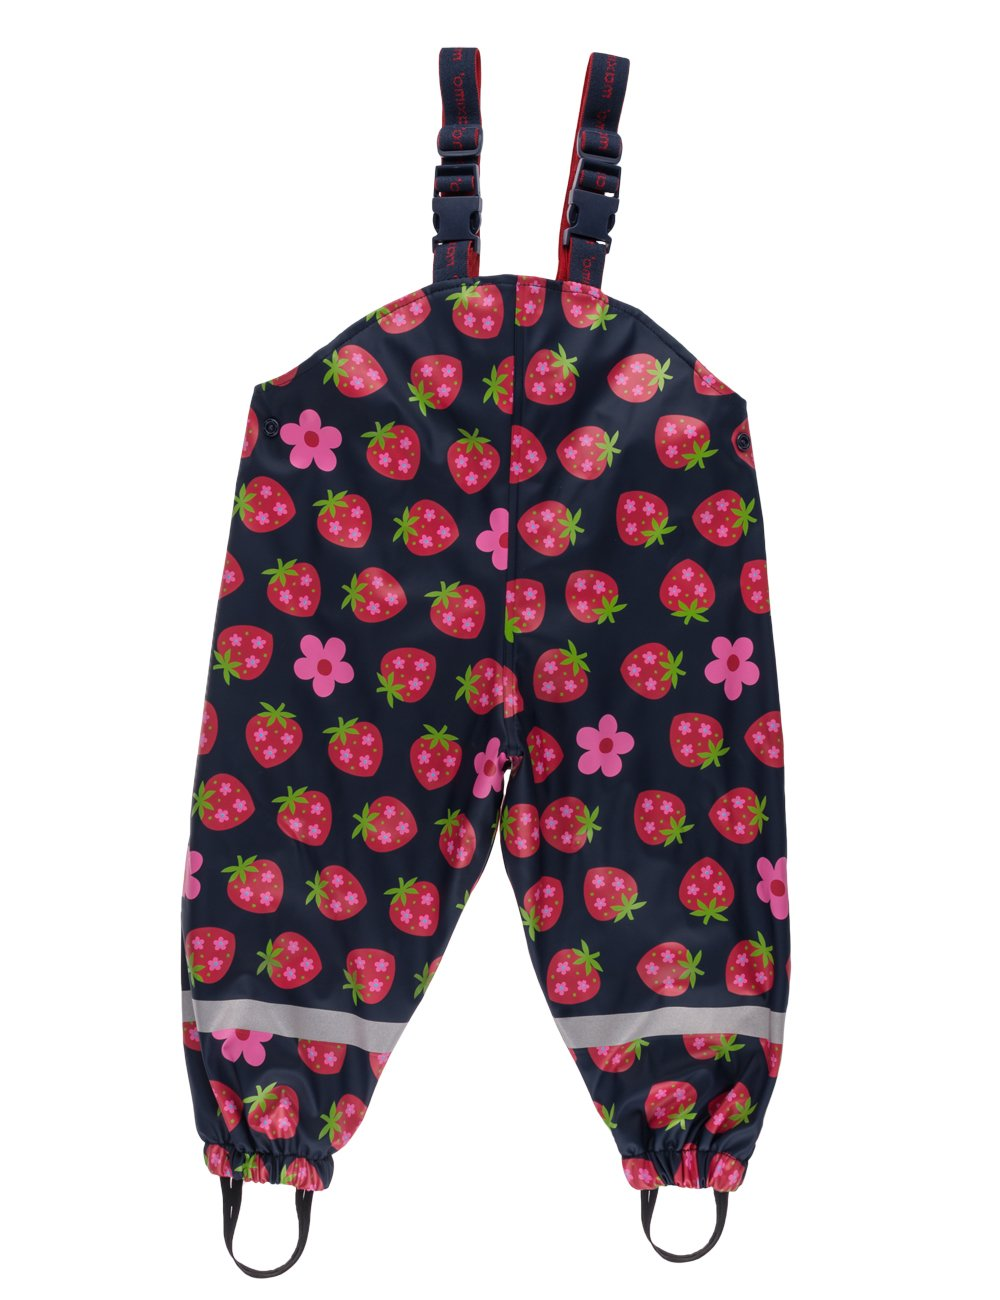 MaxiMo Regenhose Erdbeere, Jerseyfutter, Pantaloni impermeabili per bambine e ragazze 56203-735900